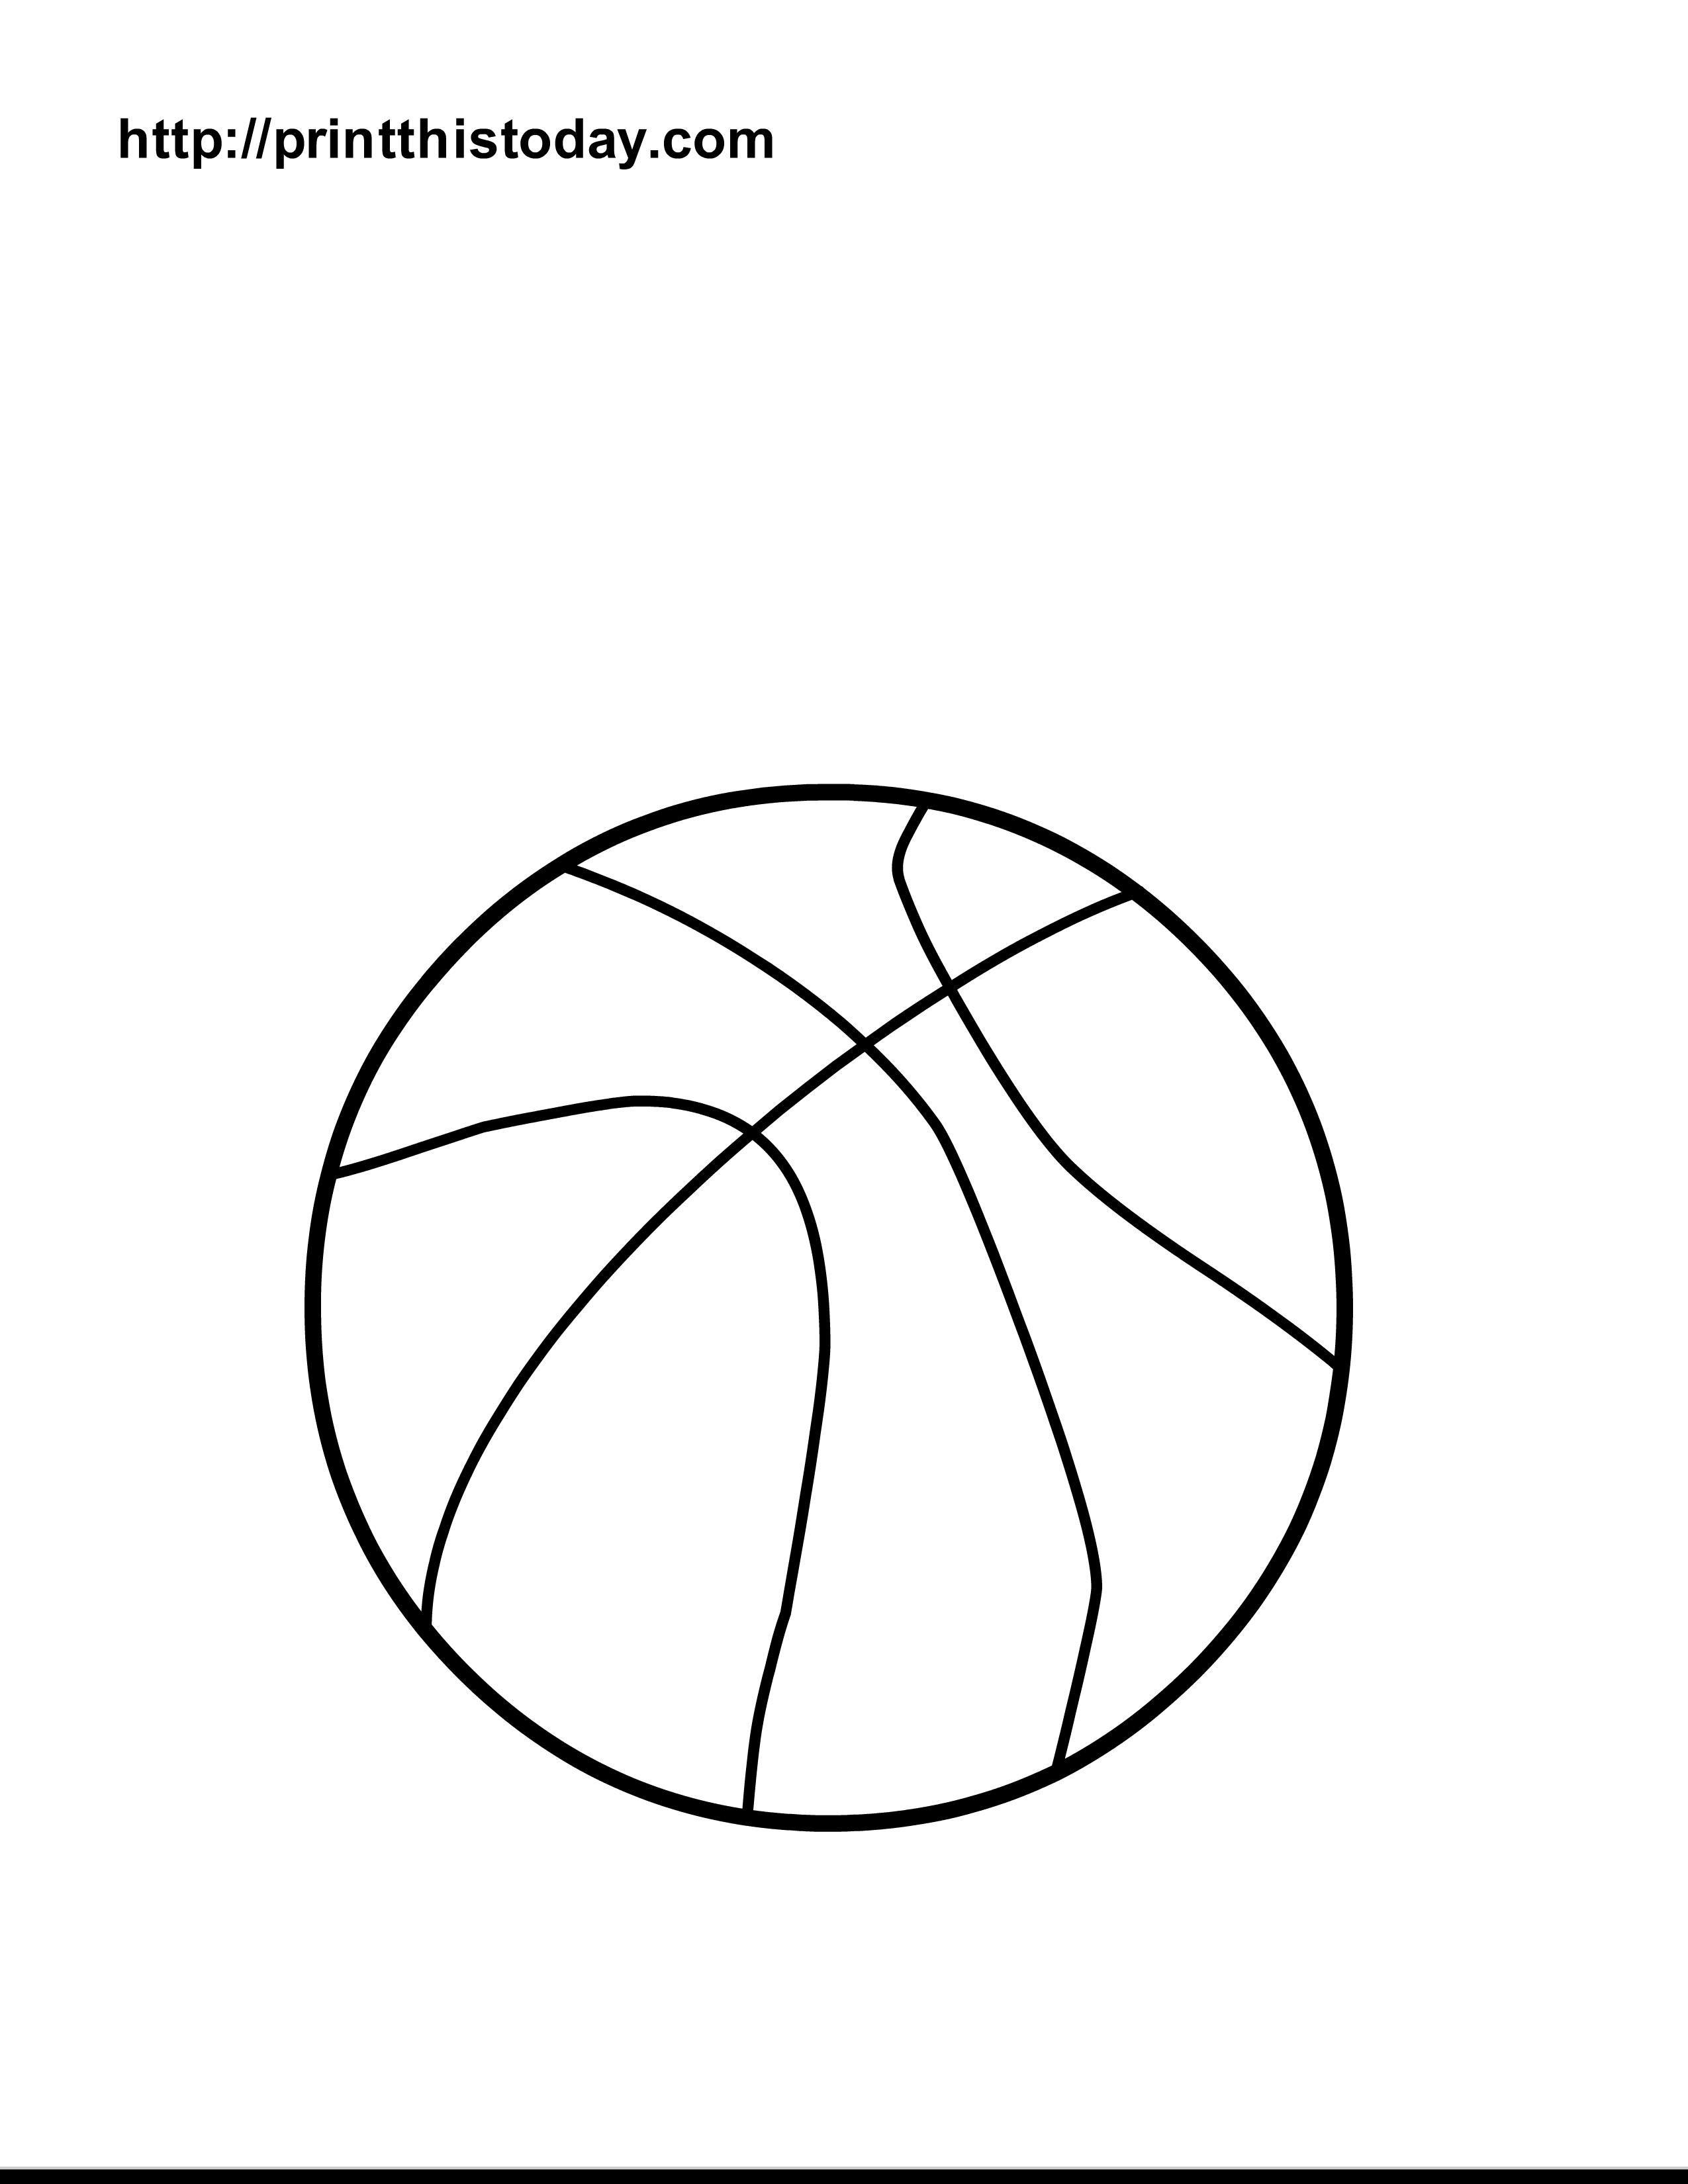 ball coloring balls printable pages sports basketball tennis printables sheet basket clipart worksheet worksheets print templates sheets beach preschool dragon